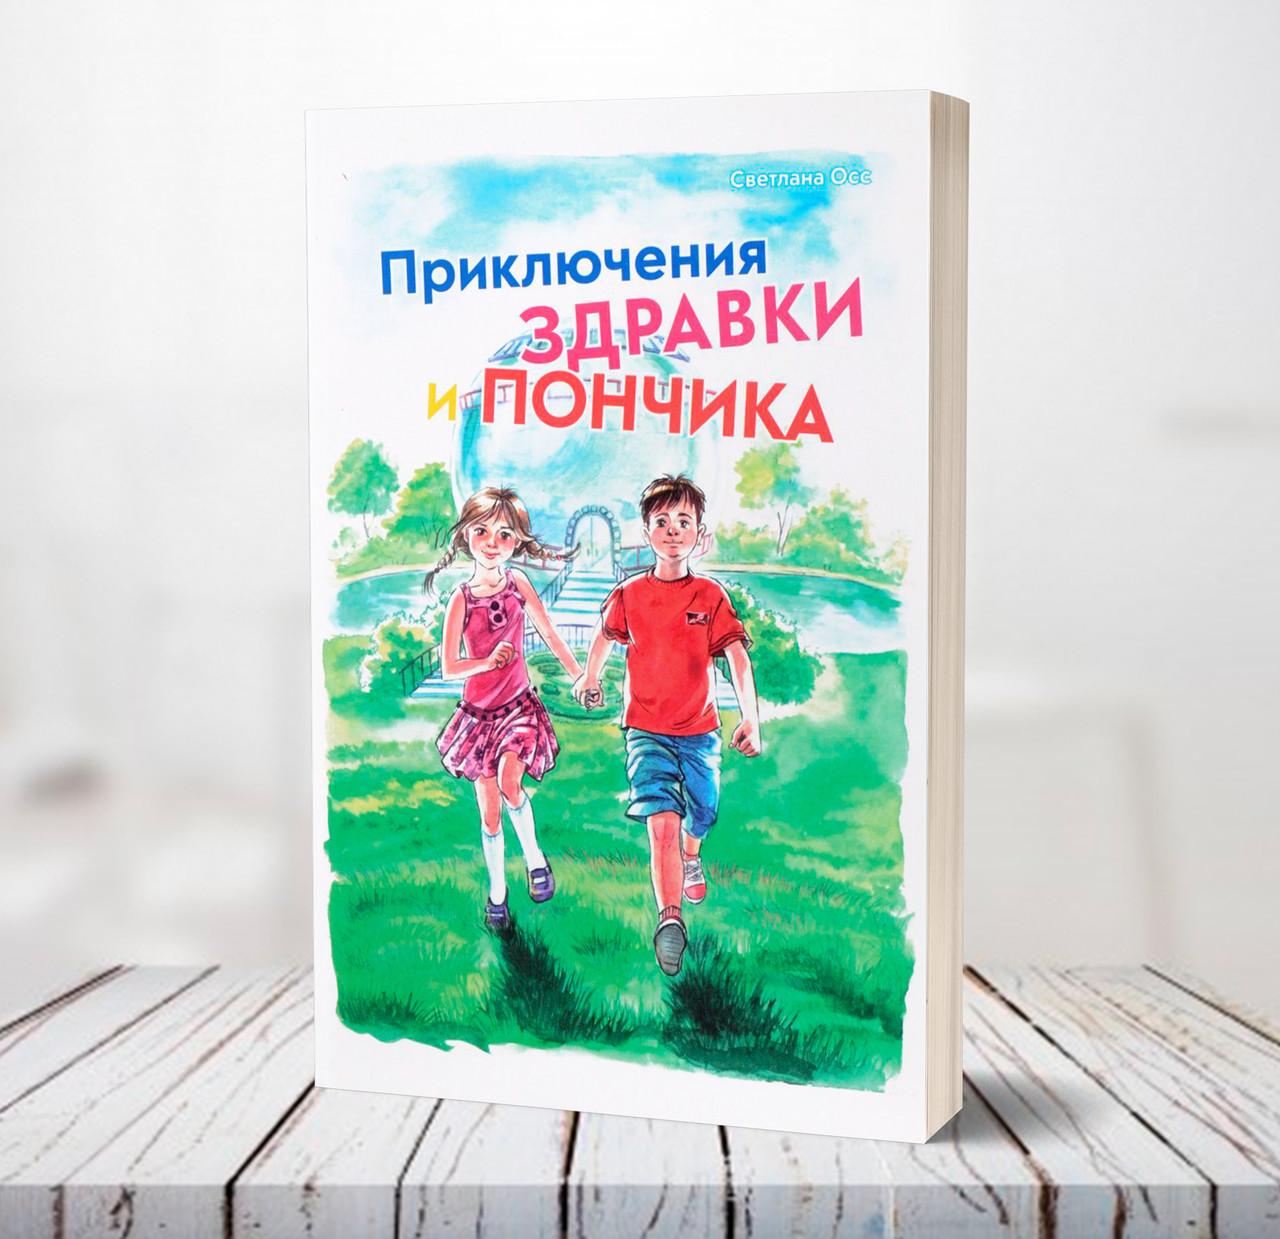 """Приключения Здравки и Пончика"" Светлана Осс"